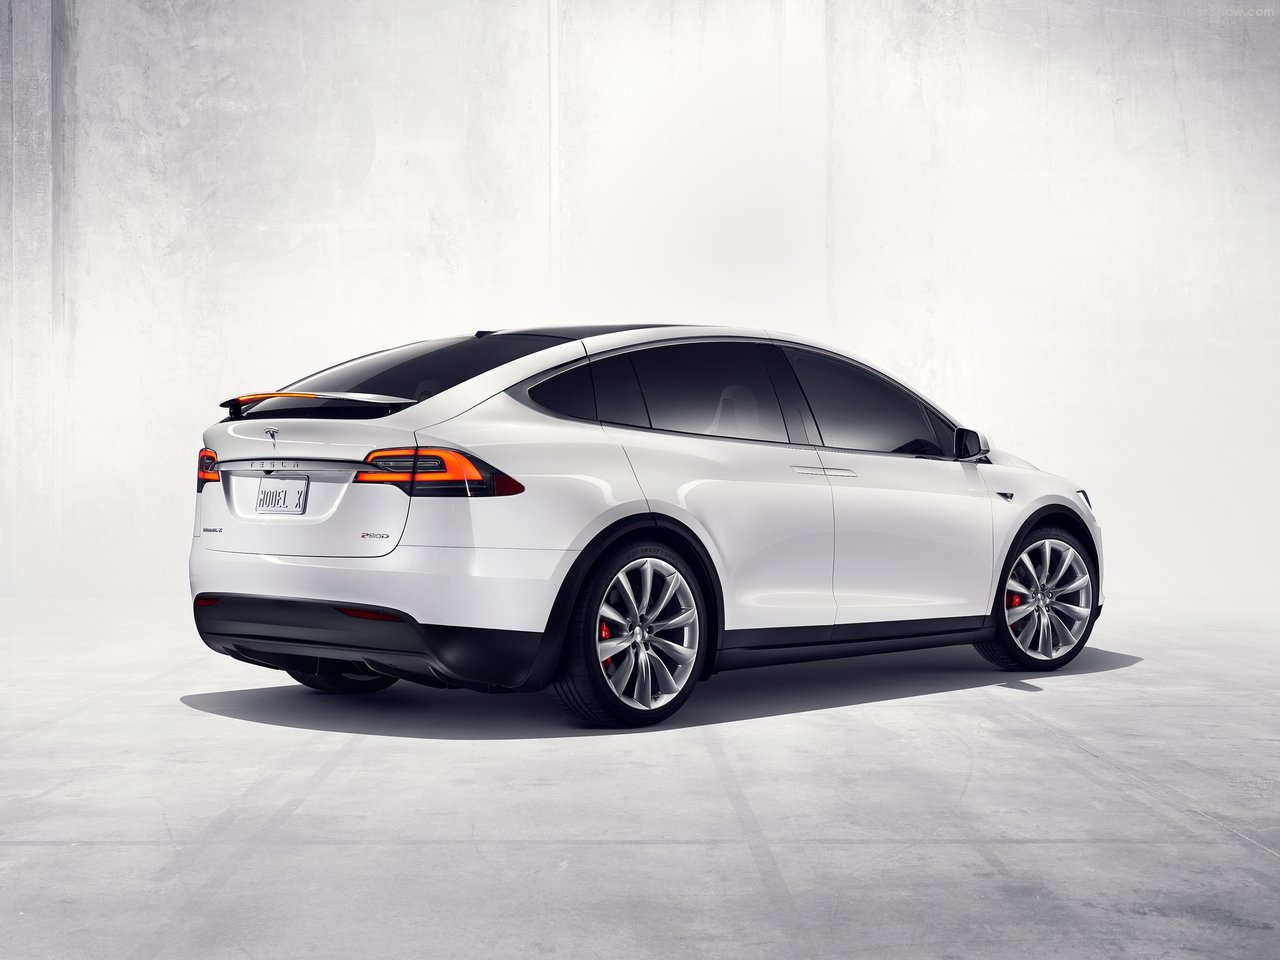 Tesla-Model_X_2017_1280x960_wallpaper_06